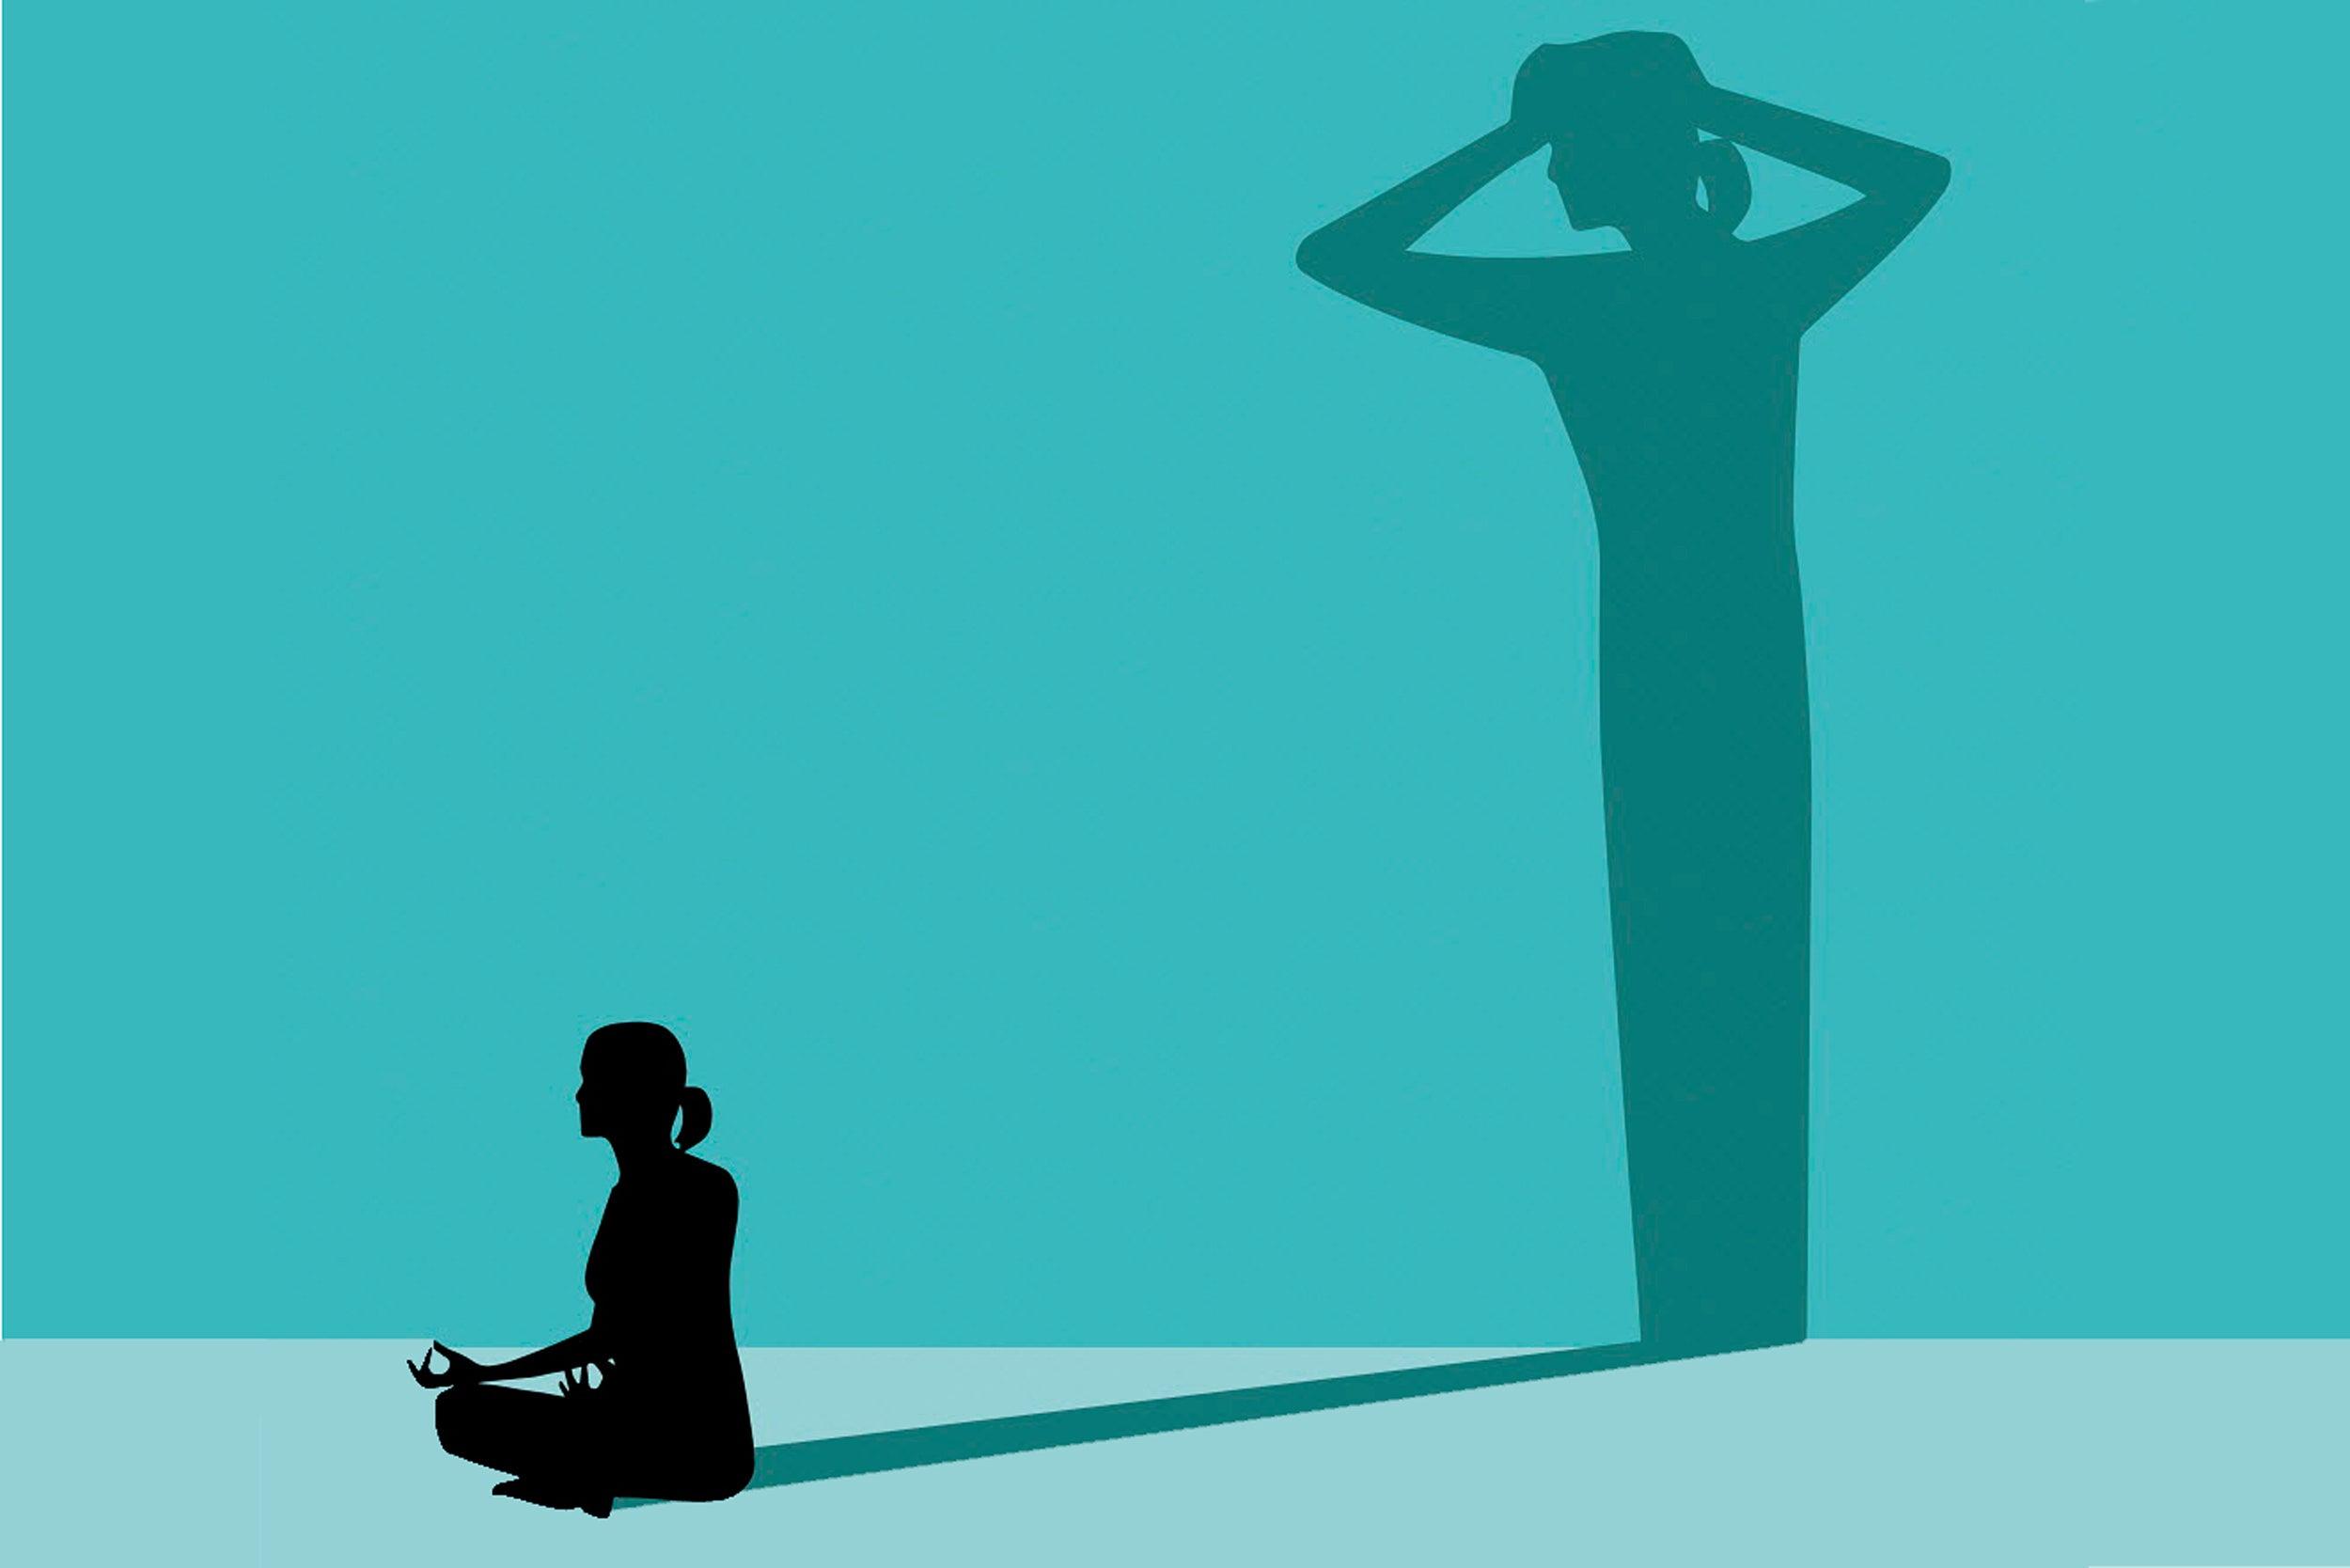 Illustration of meditator with fear shadow